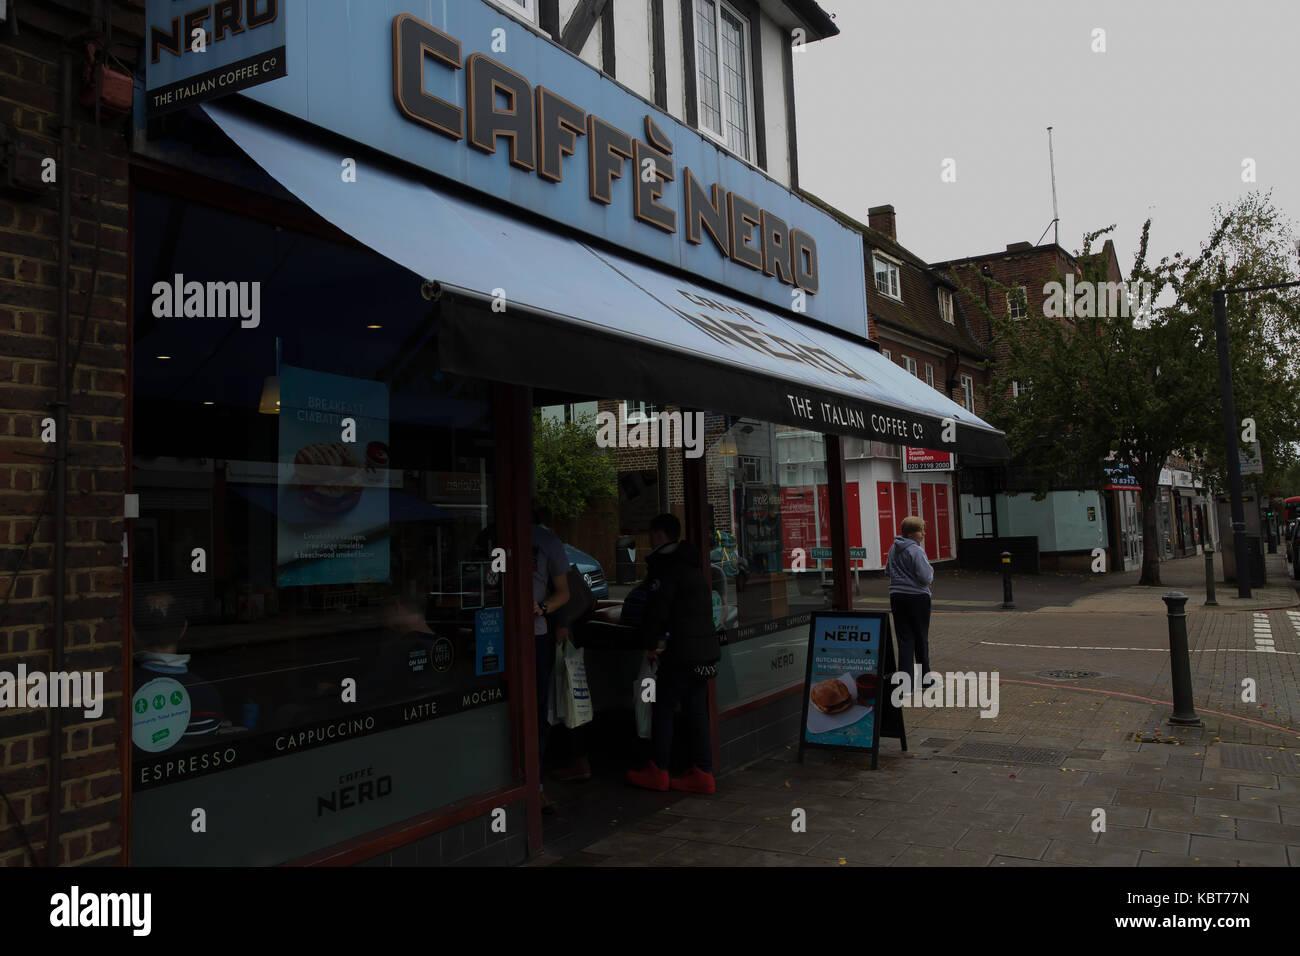 West Wickham, UK. 1st Oct, 2017. International Coffee Day Credit: Keith Larby/Alamy Live News - Stock Image